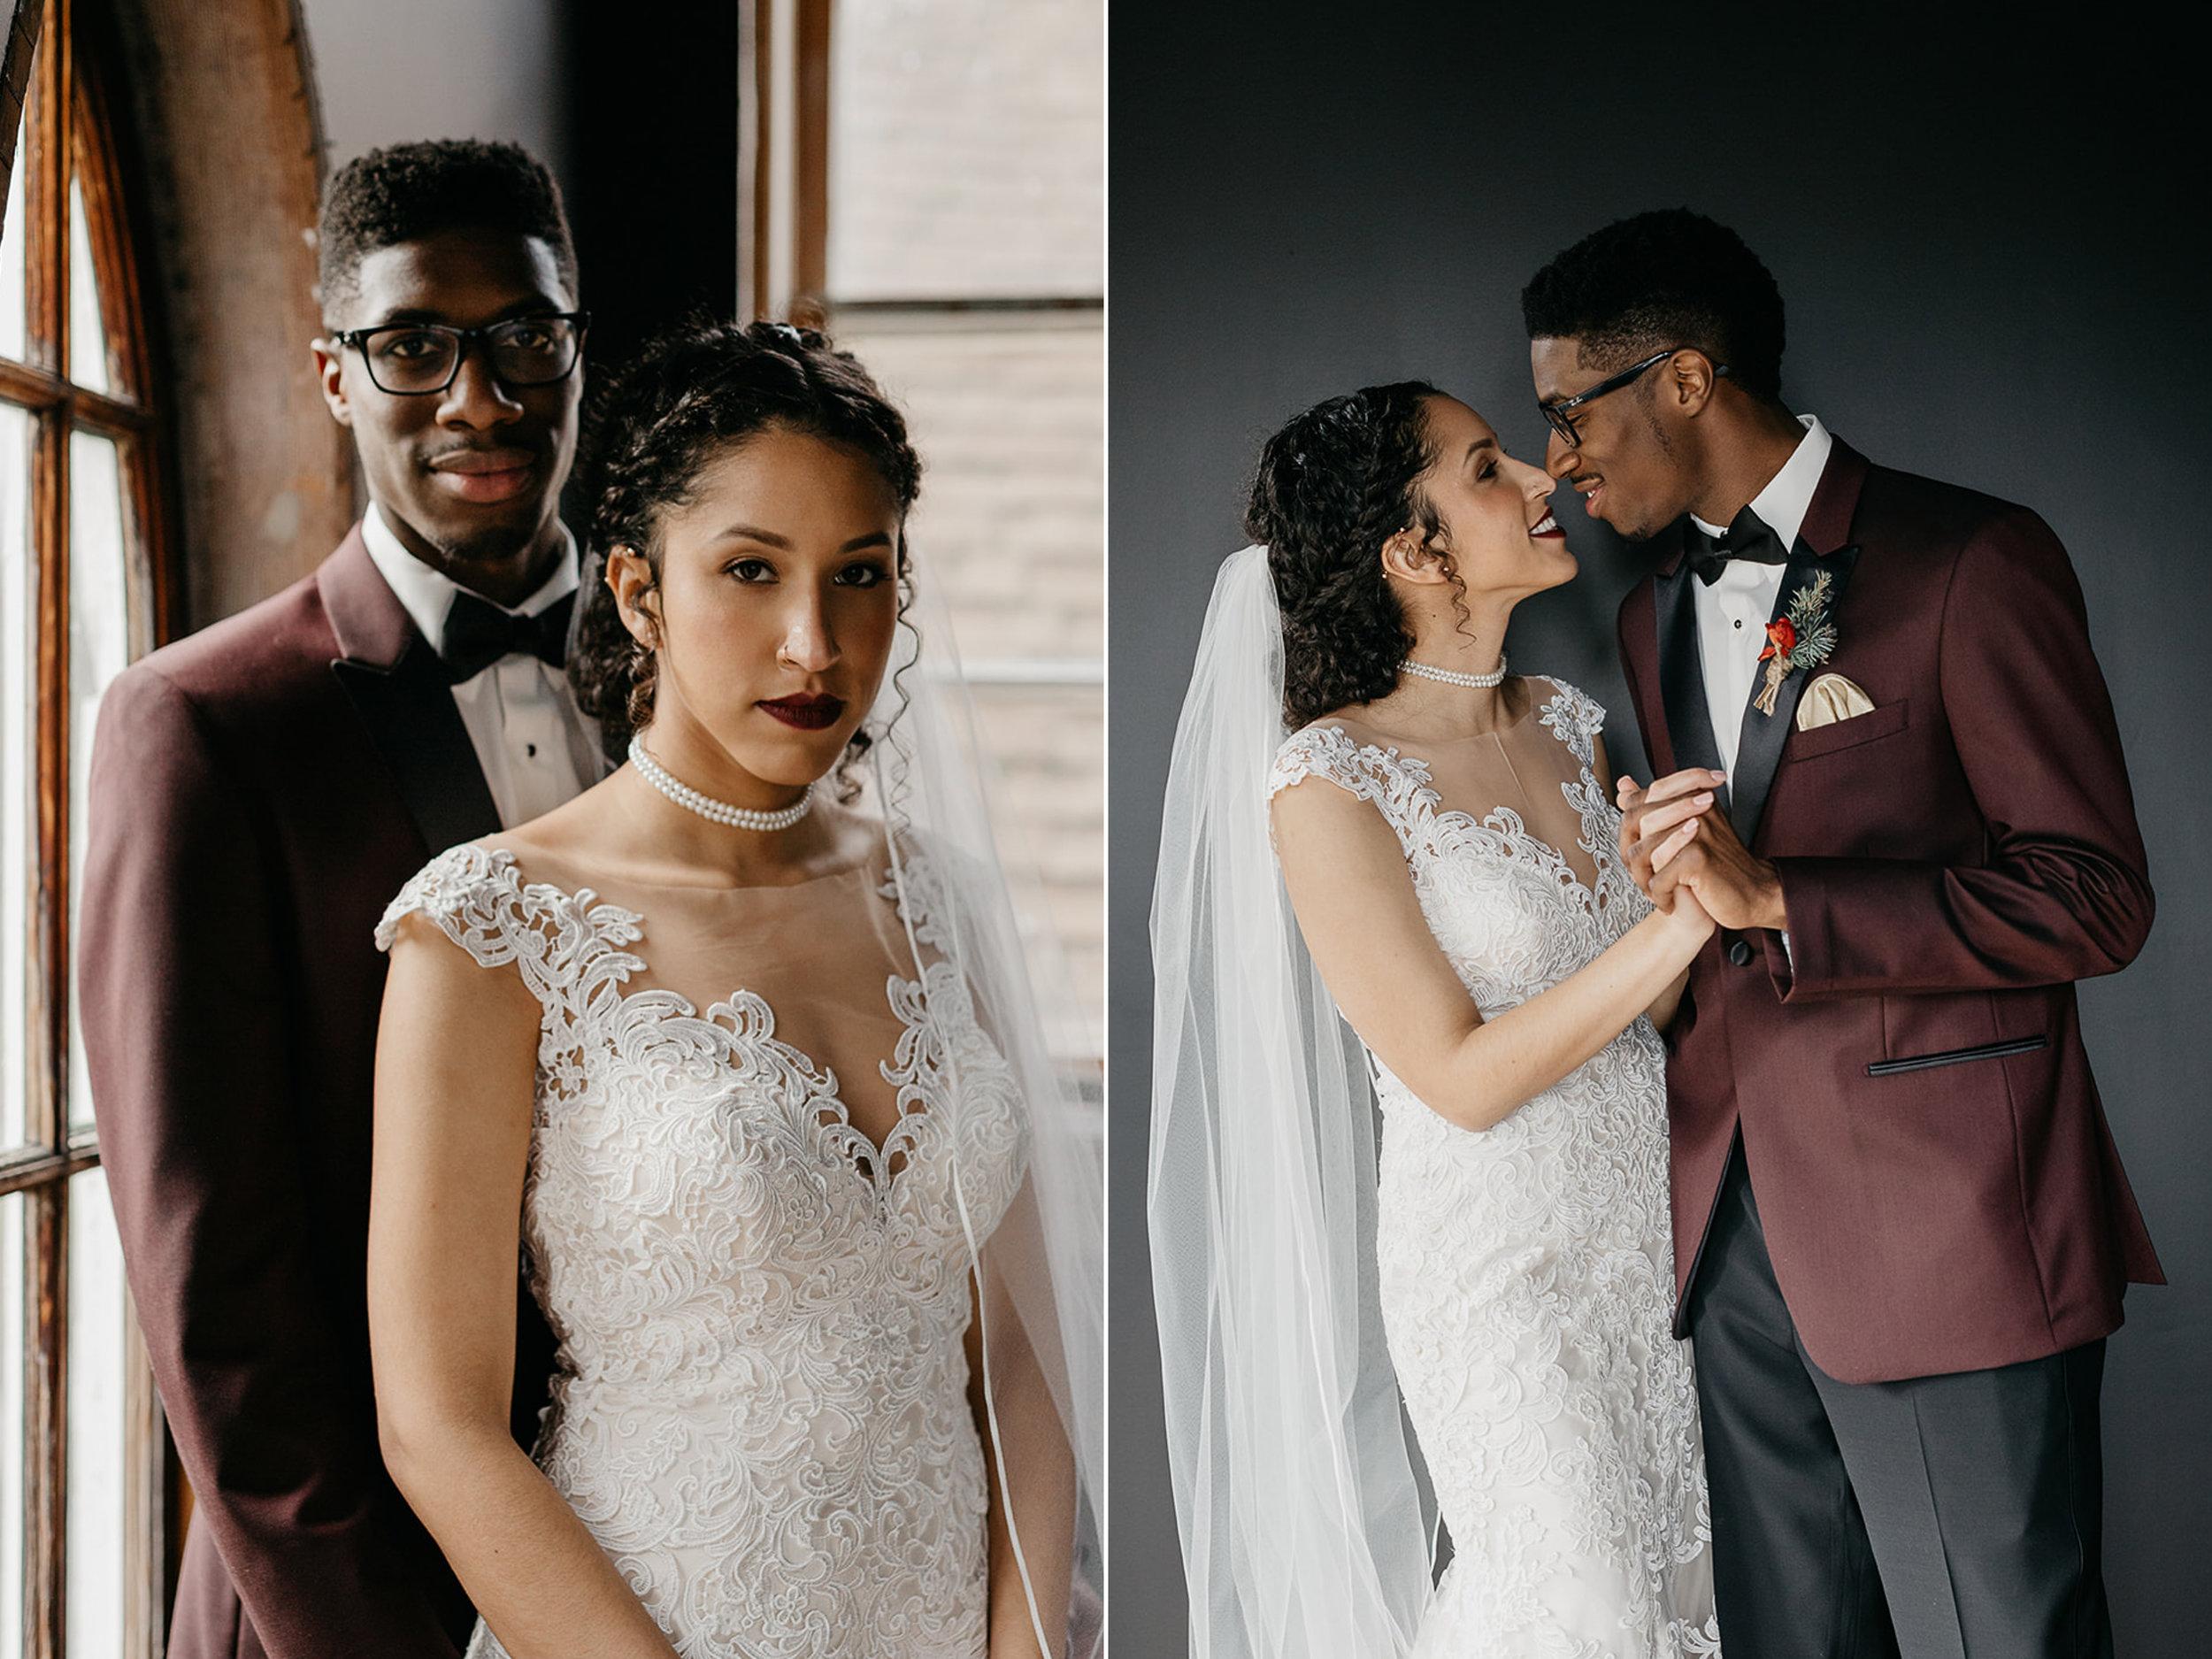 portland - wedding - photographer 011.jpg